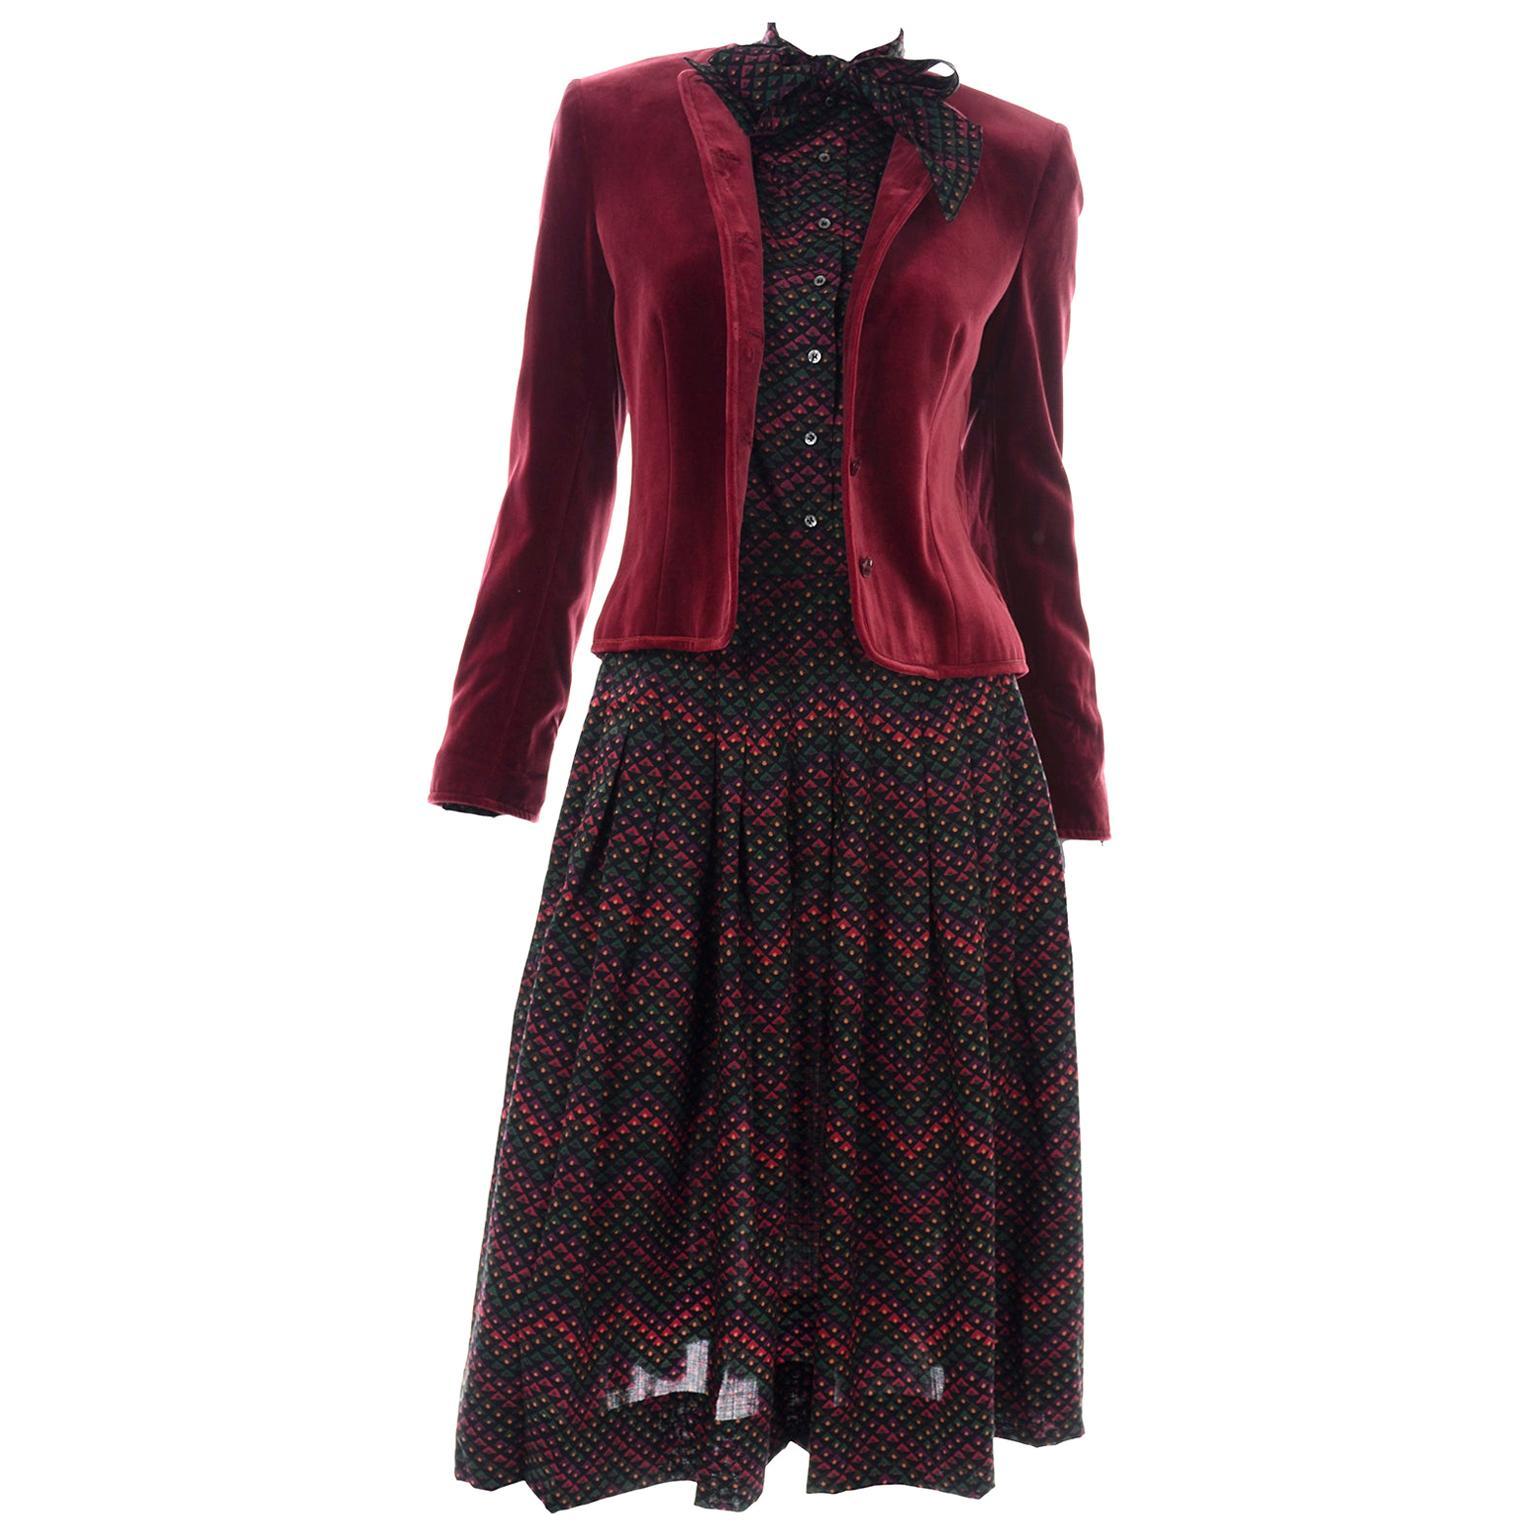 3pc Jaeger Burgundy Velvet Jacket w/  Printed Wool Blouse Top With & Skirt Suit